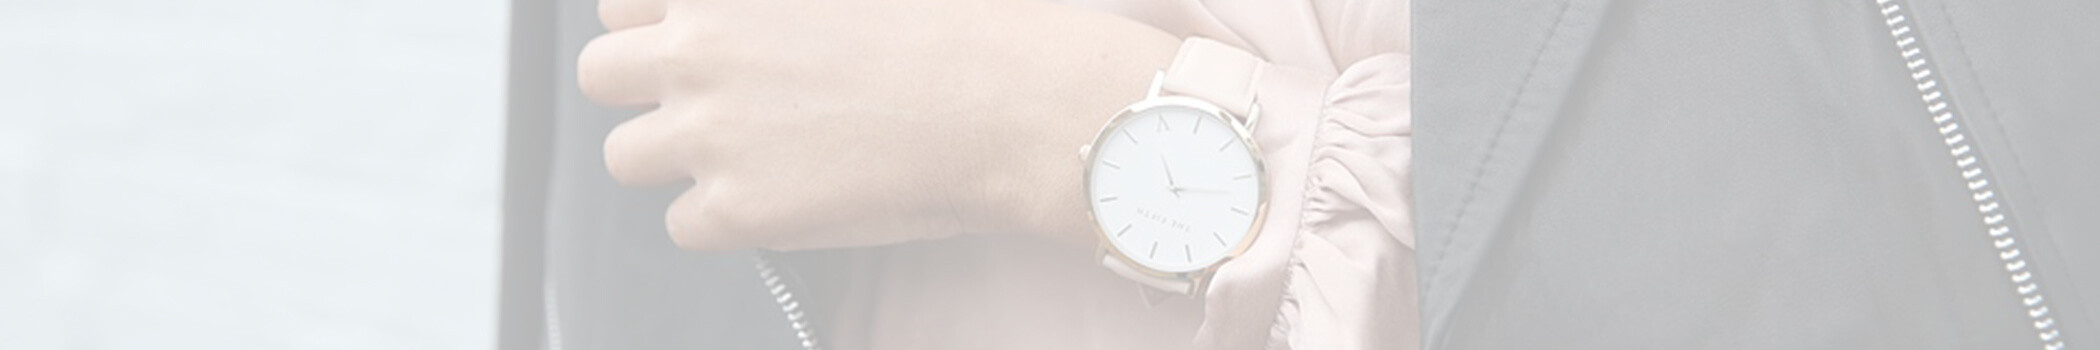 Relojes para mujer - Carmena Joyeros